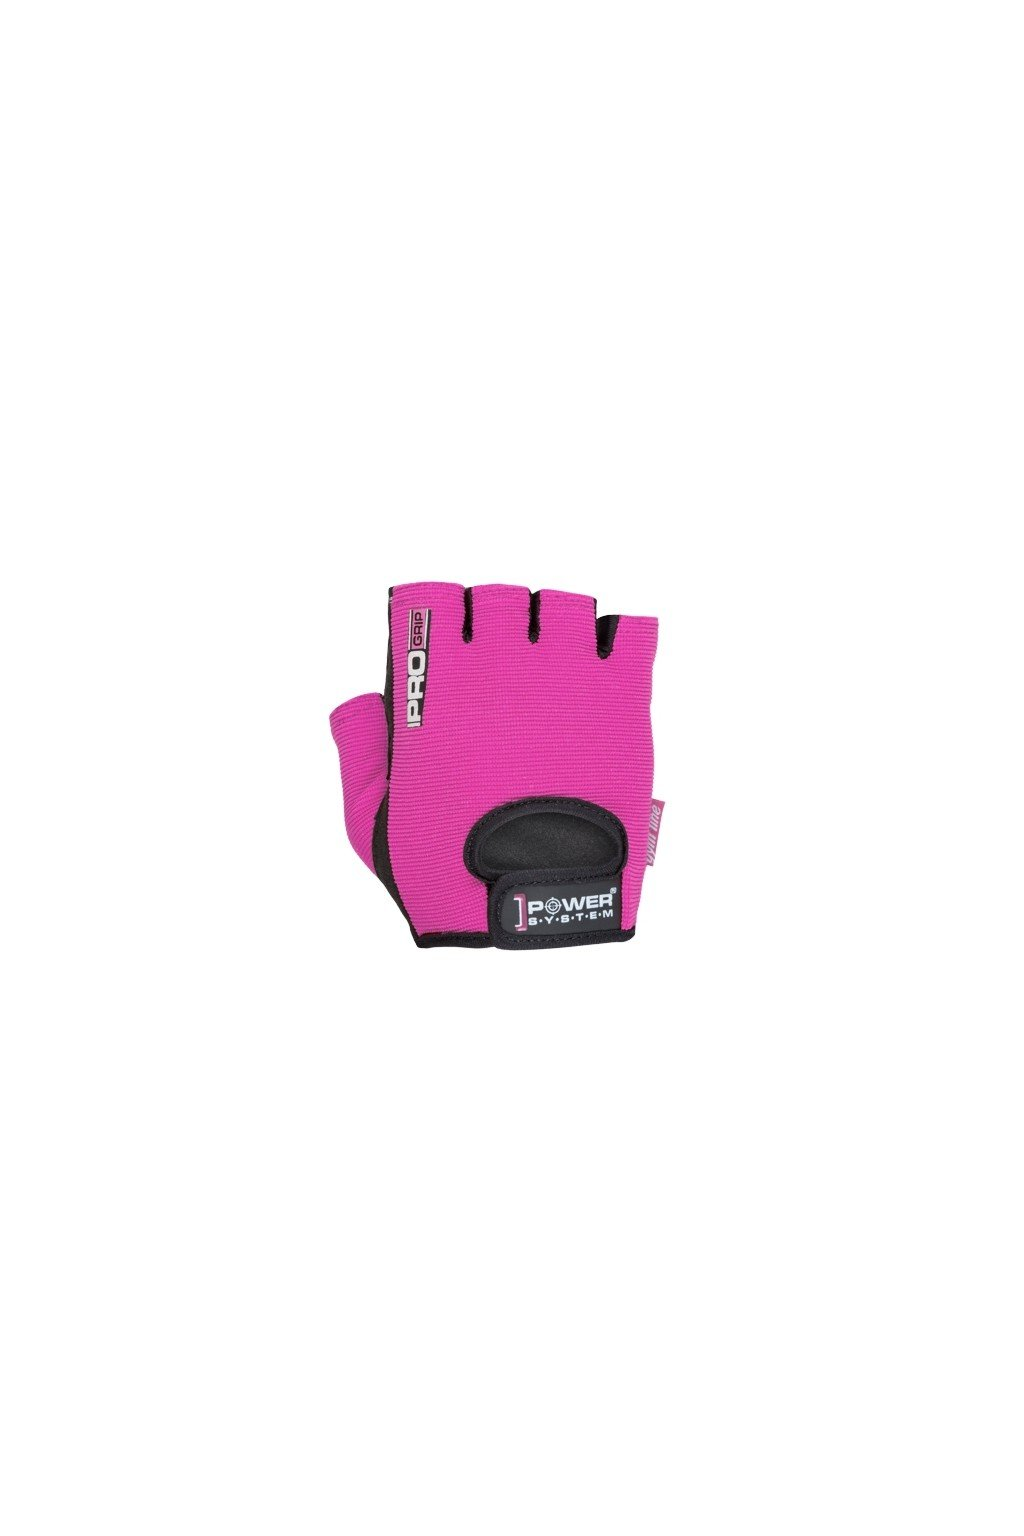 power system fitness rukavice pro grip